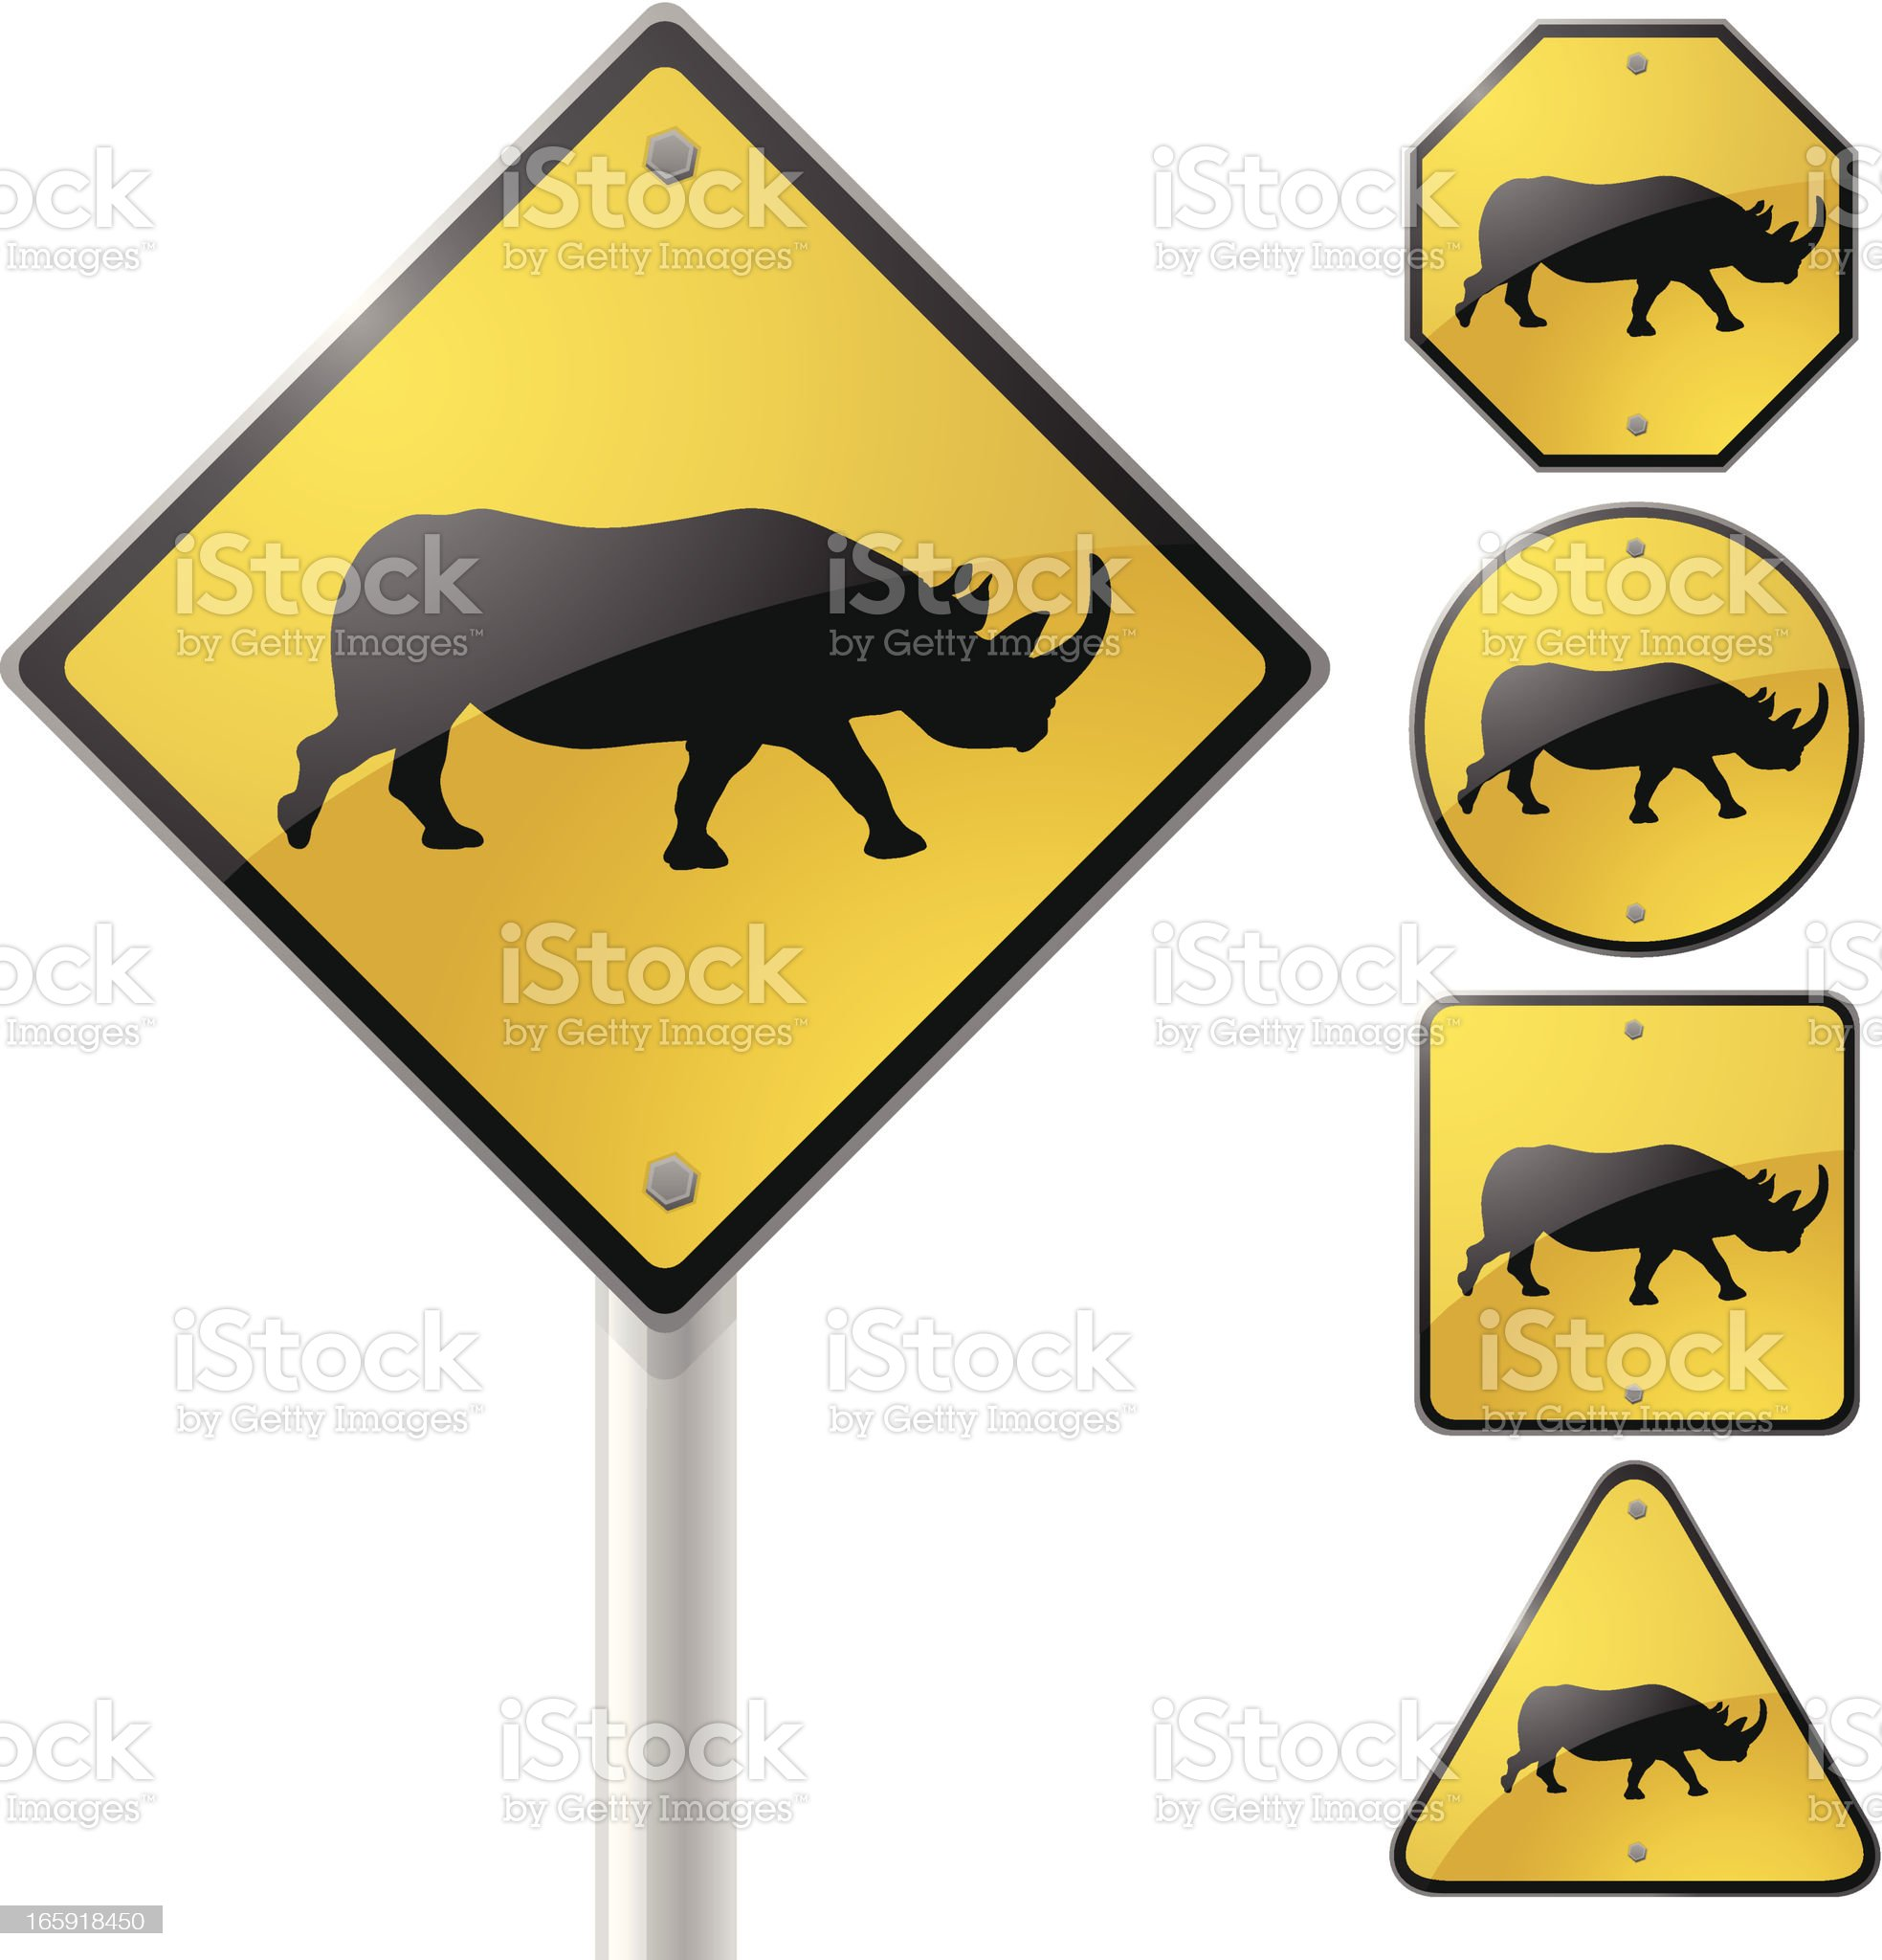 Rhino Crossing Sign royalty-free stock vector art